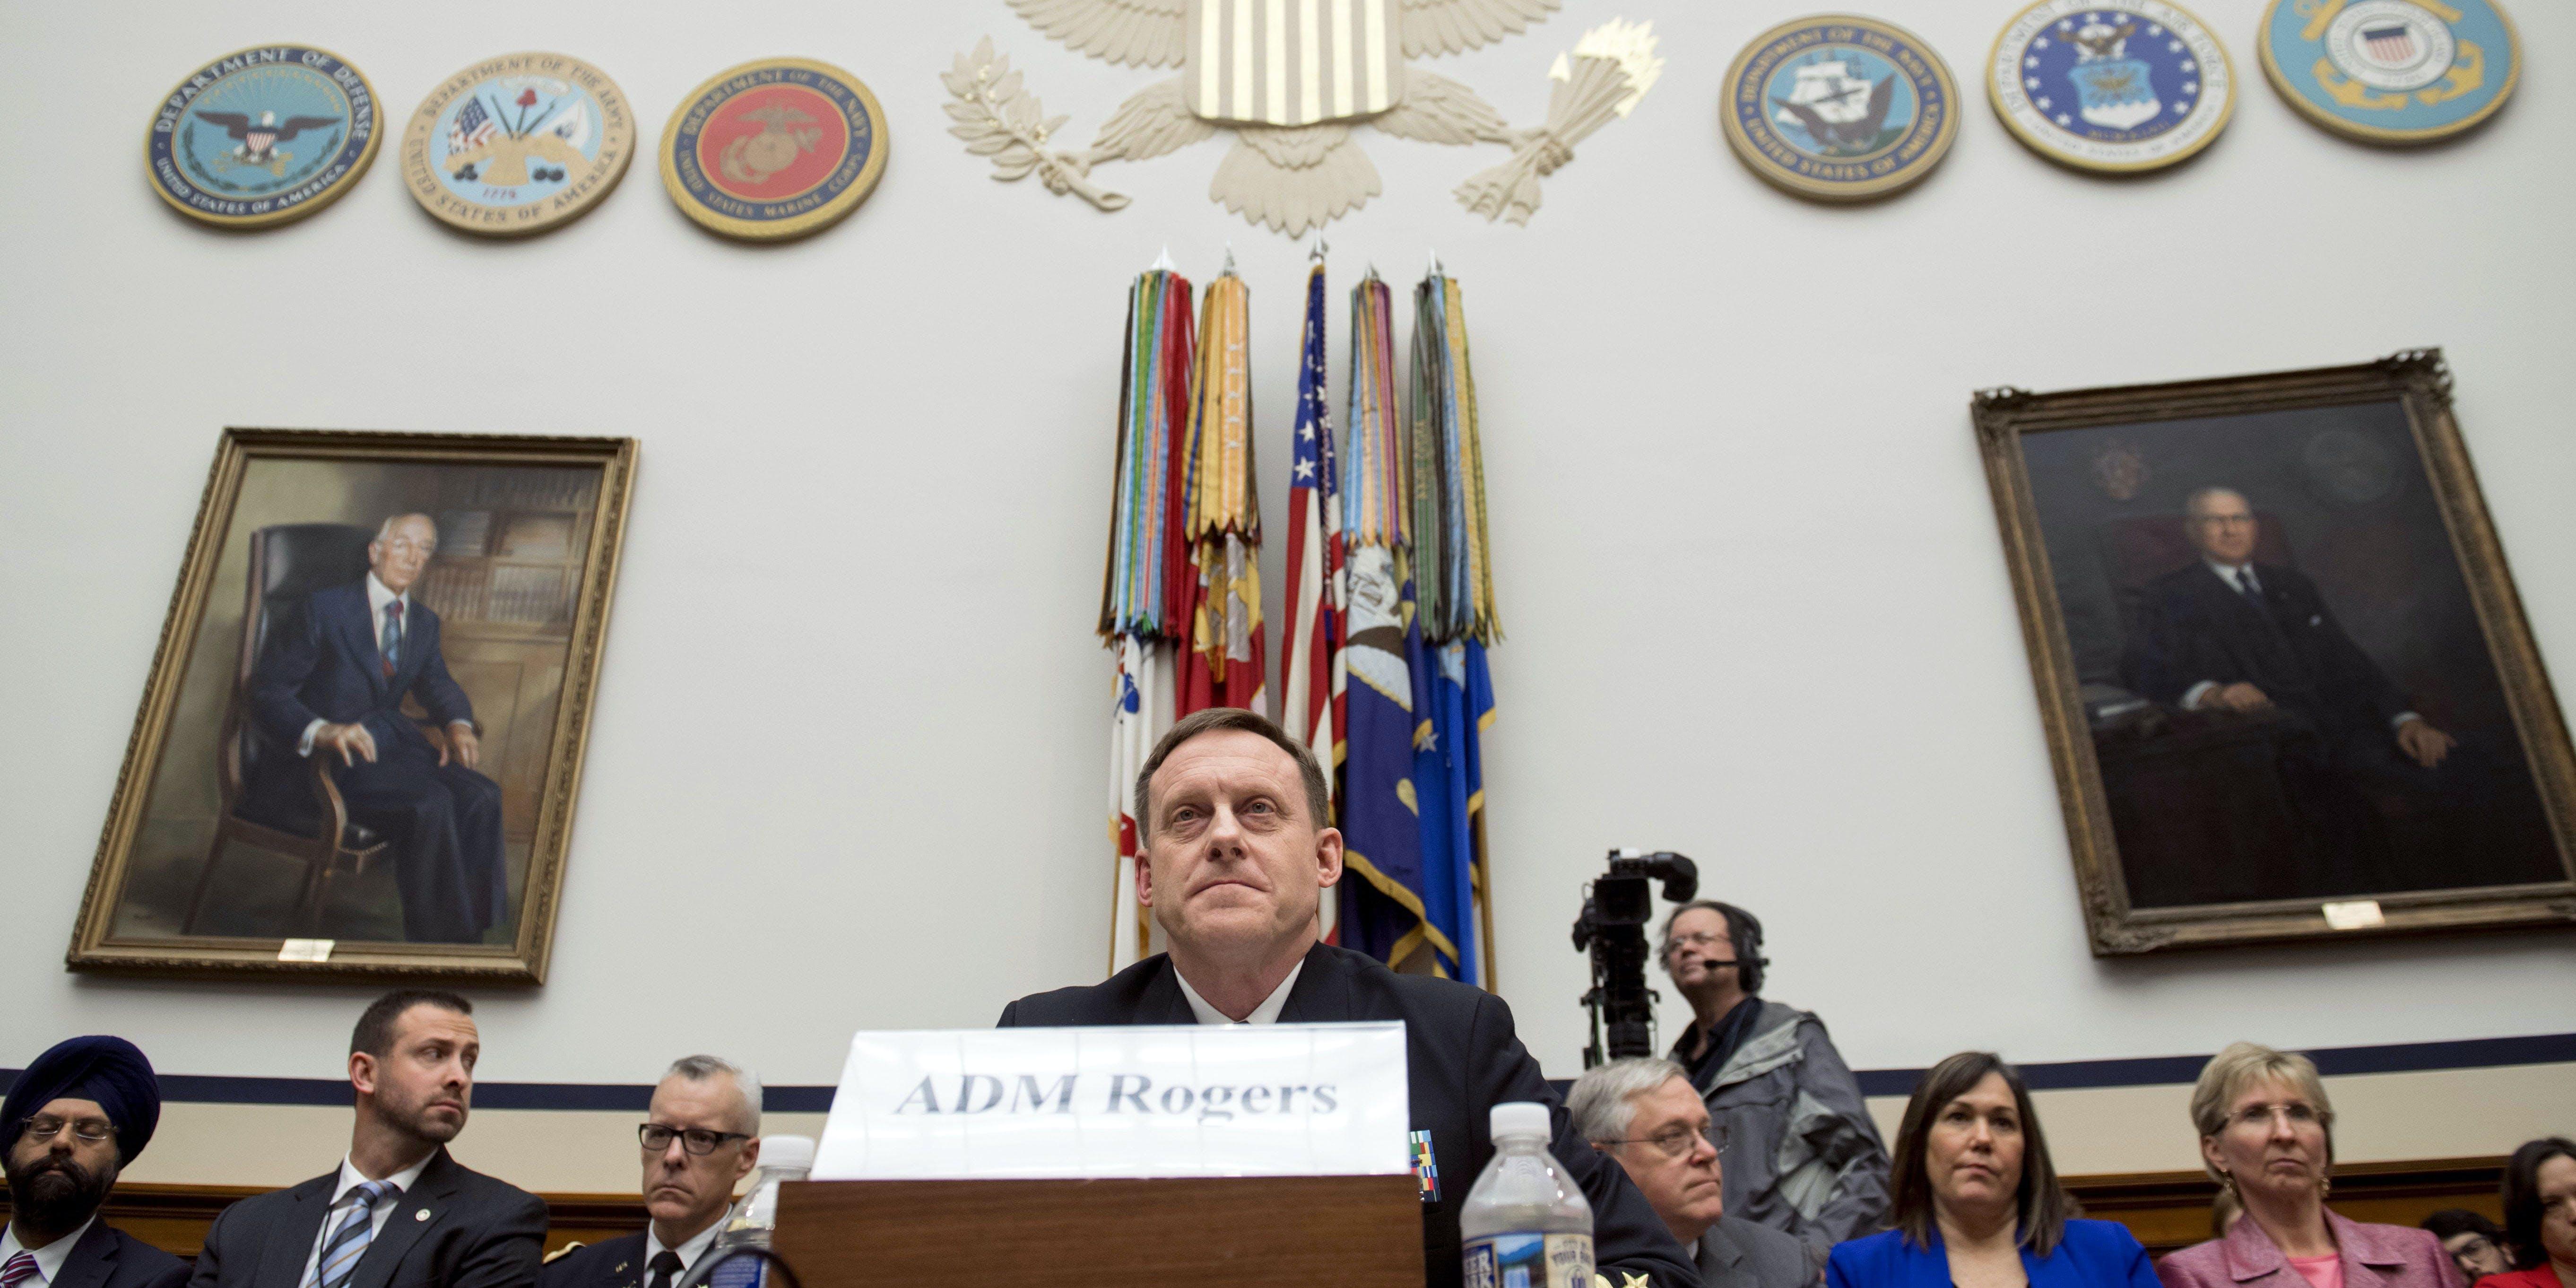 Trump Administration Lobbying Hard For Sweeping Surveillance Law